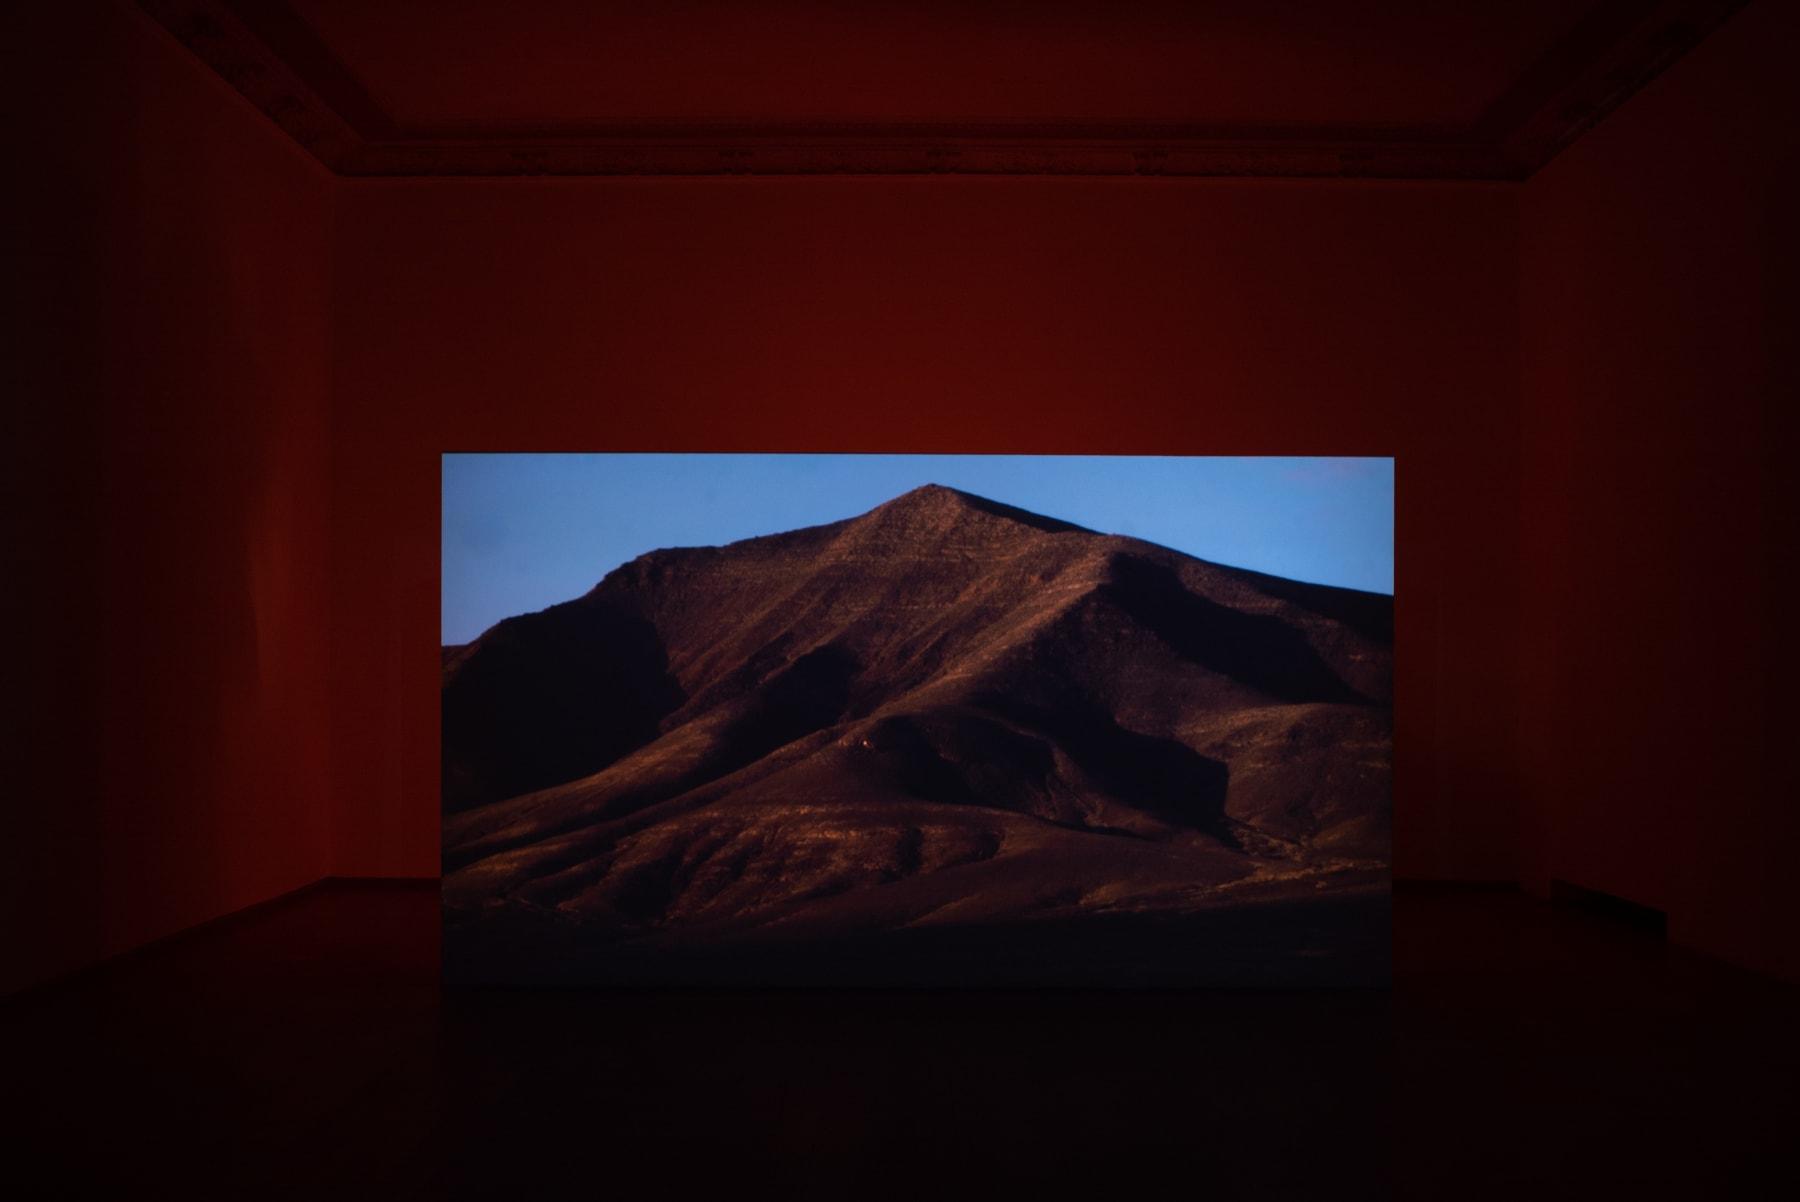 Galerija Vartai, 2020 Installation shot from Geistė Marija Kinčinaitytė's solo exhibition